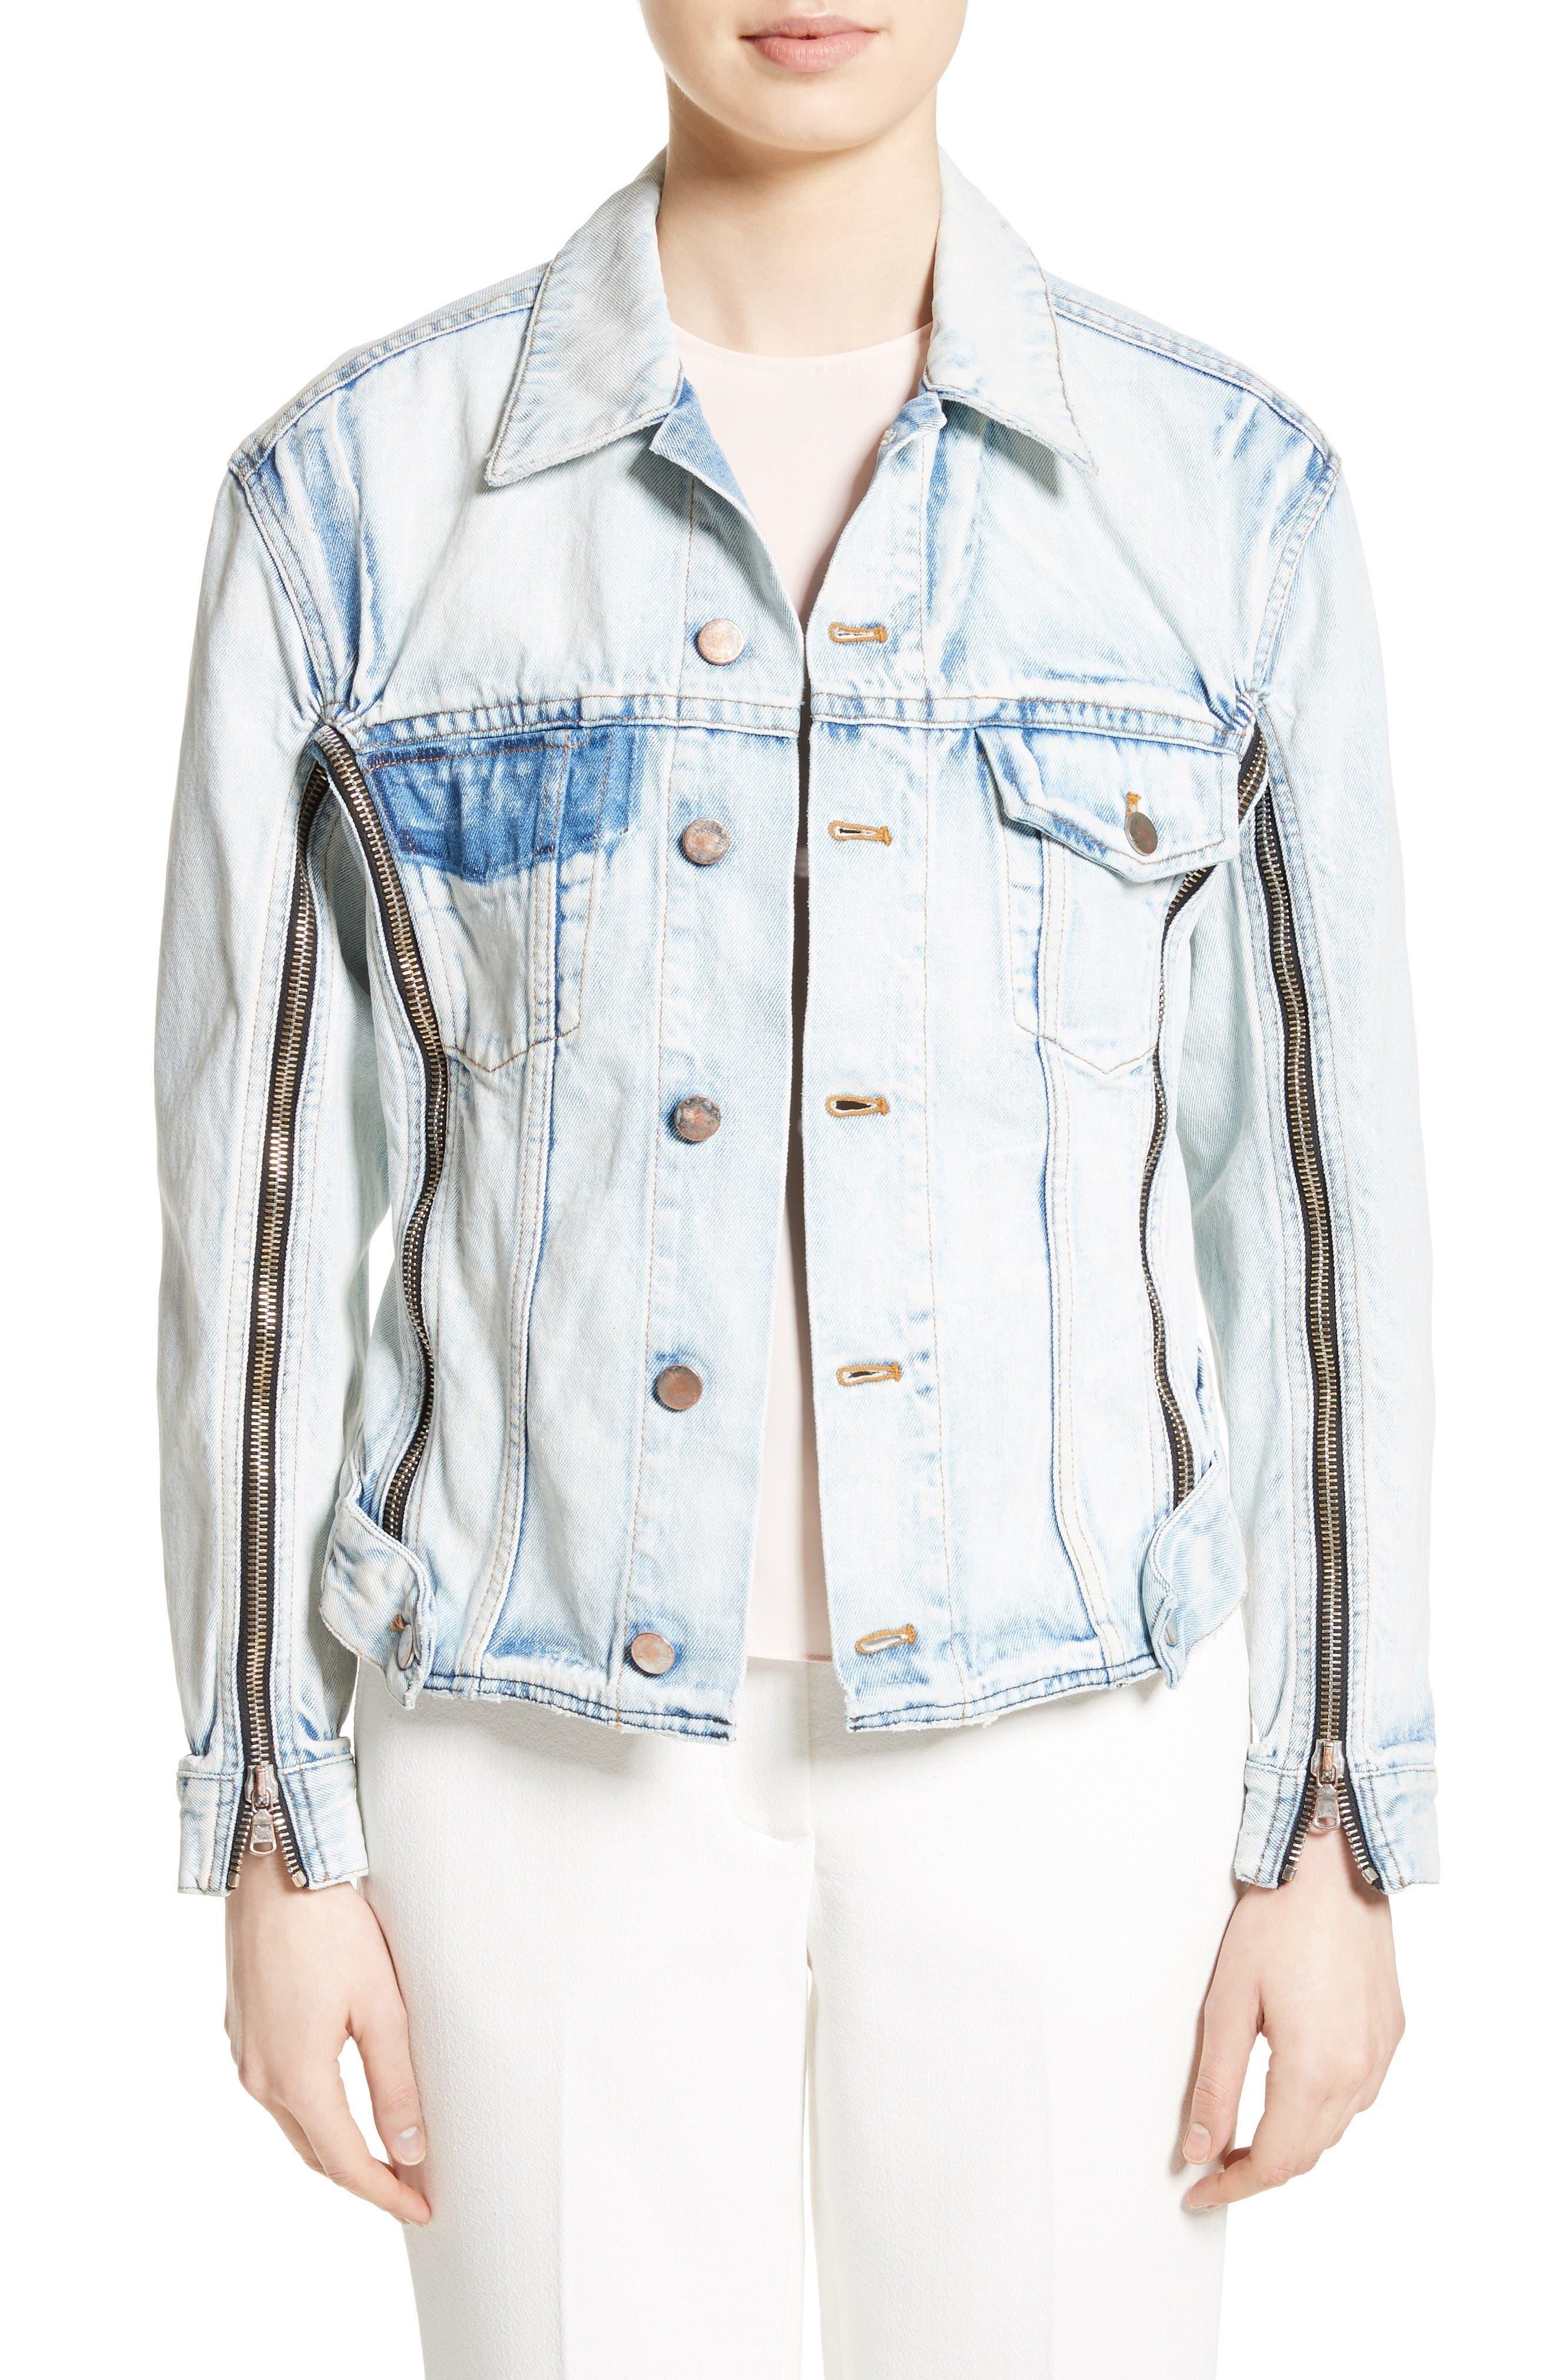 Main Image - 3.1 Phillip Lim Zipper Detail Denim Jacket